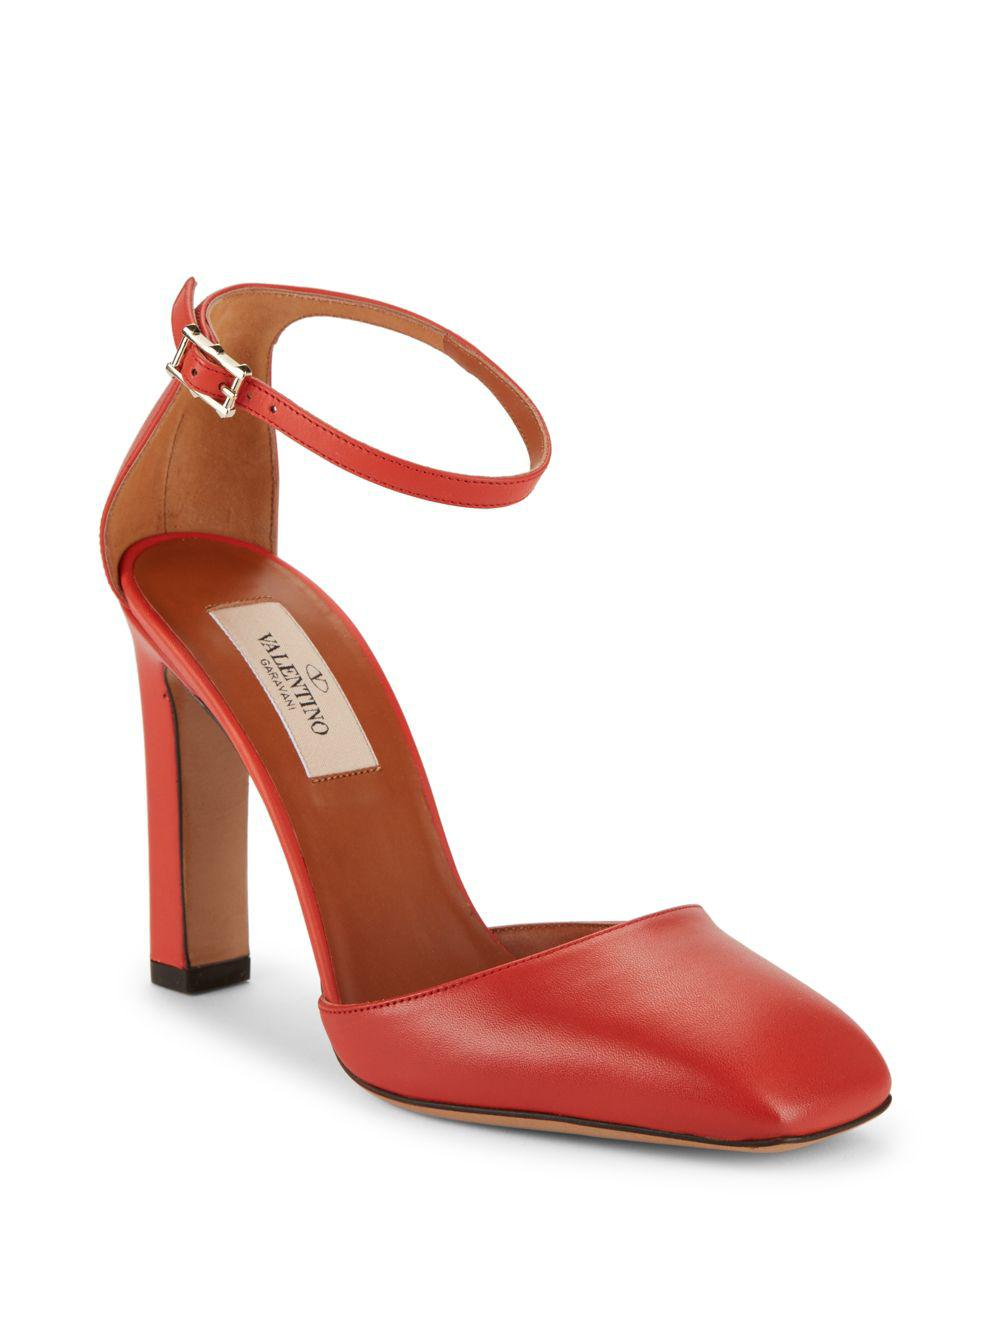 0831240ece9 Lyst - Valentino Leather Square-toe Block-heel Pumps in Orange